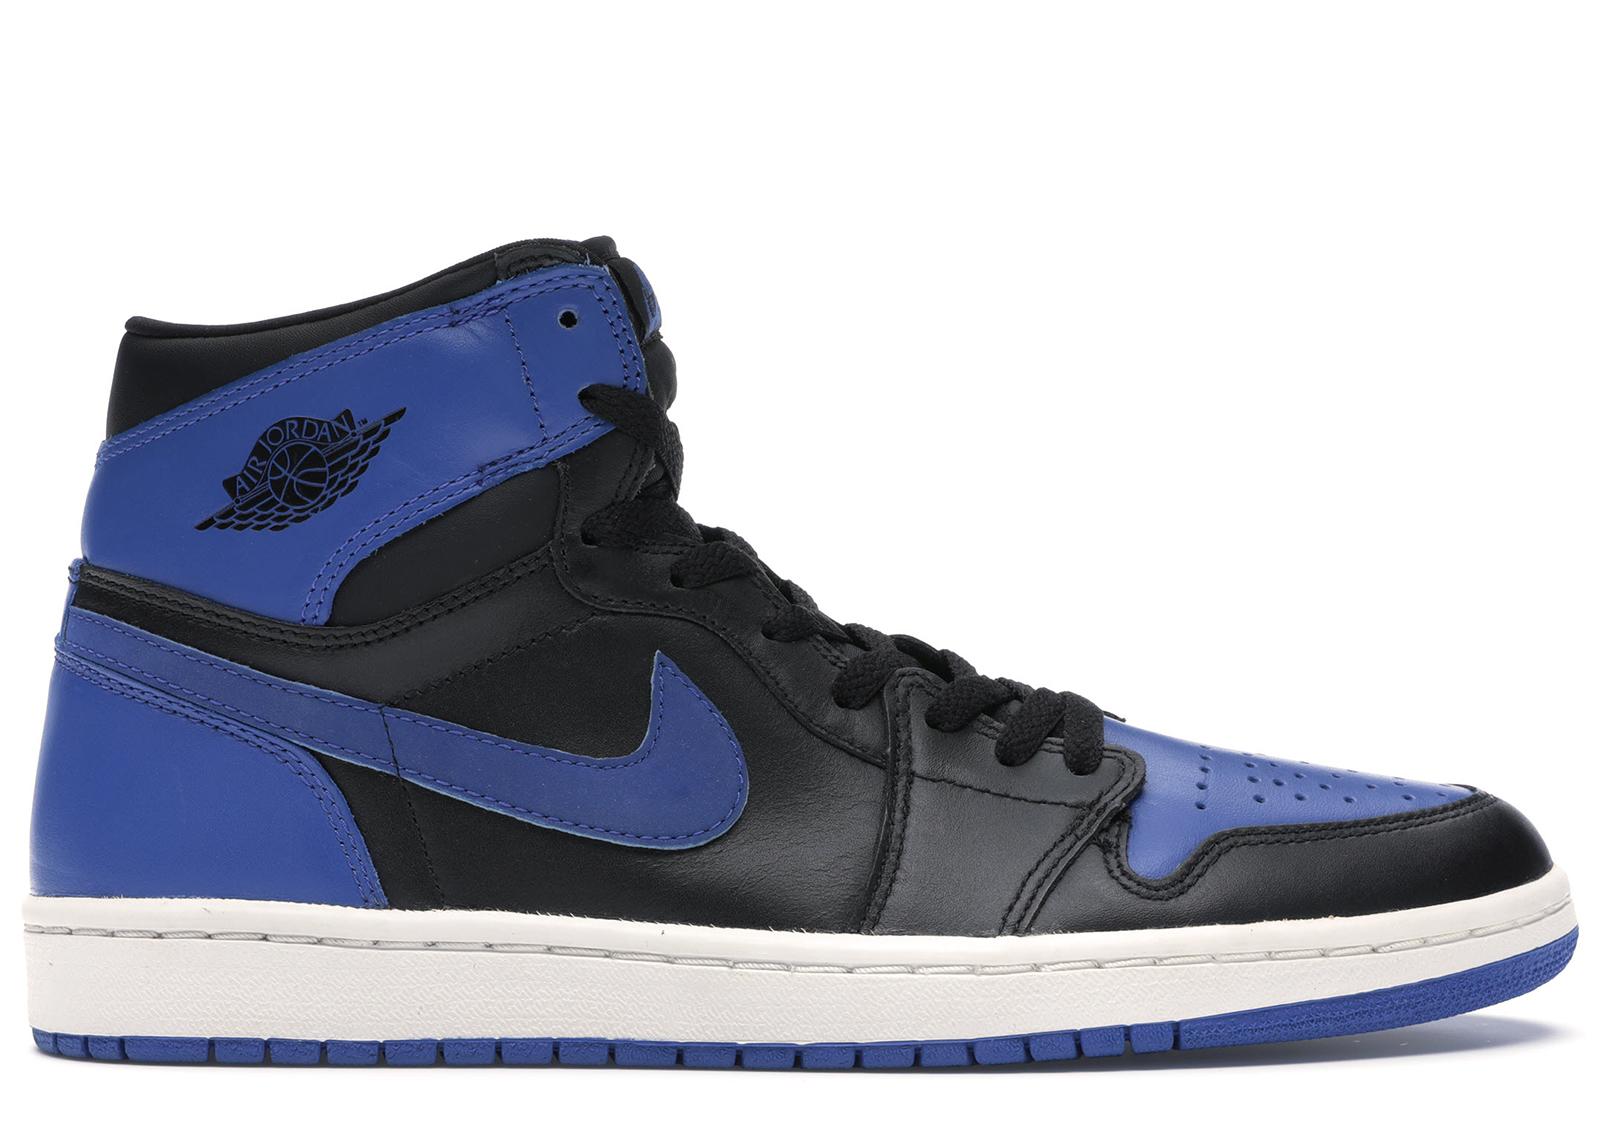 Jordan 1 Retro Black Royal Blue (2001